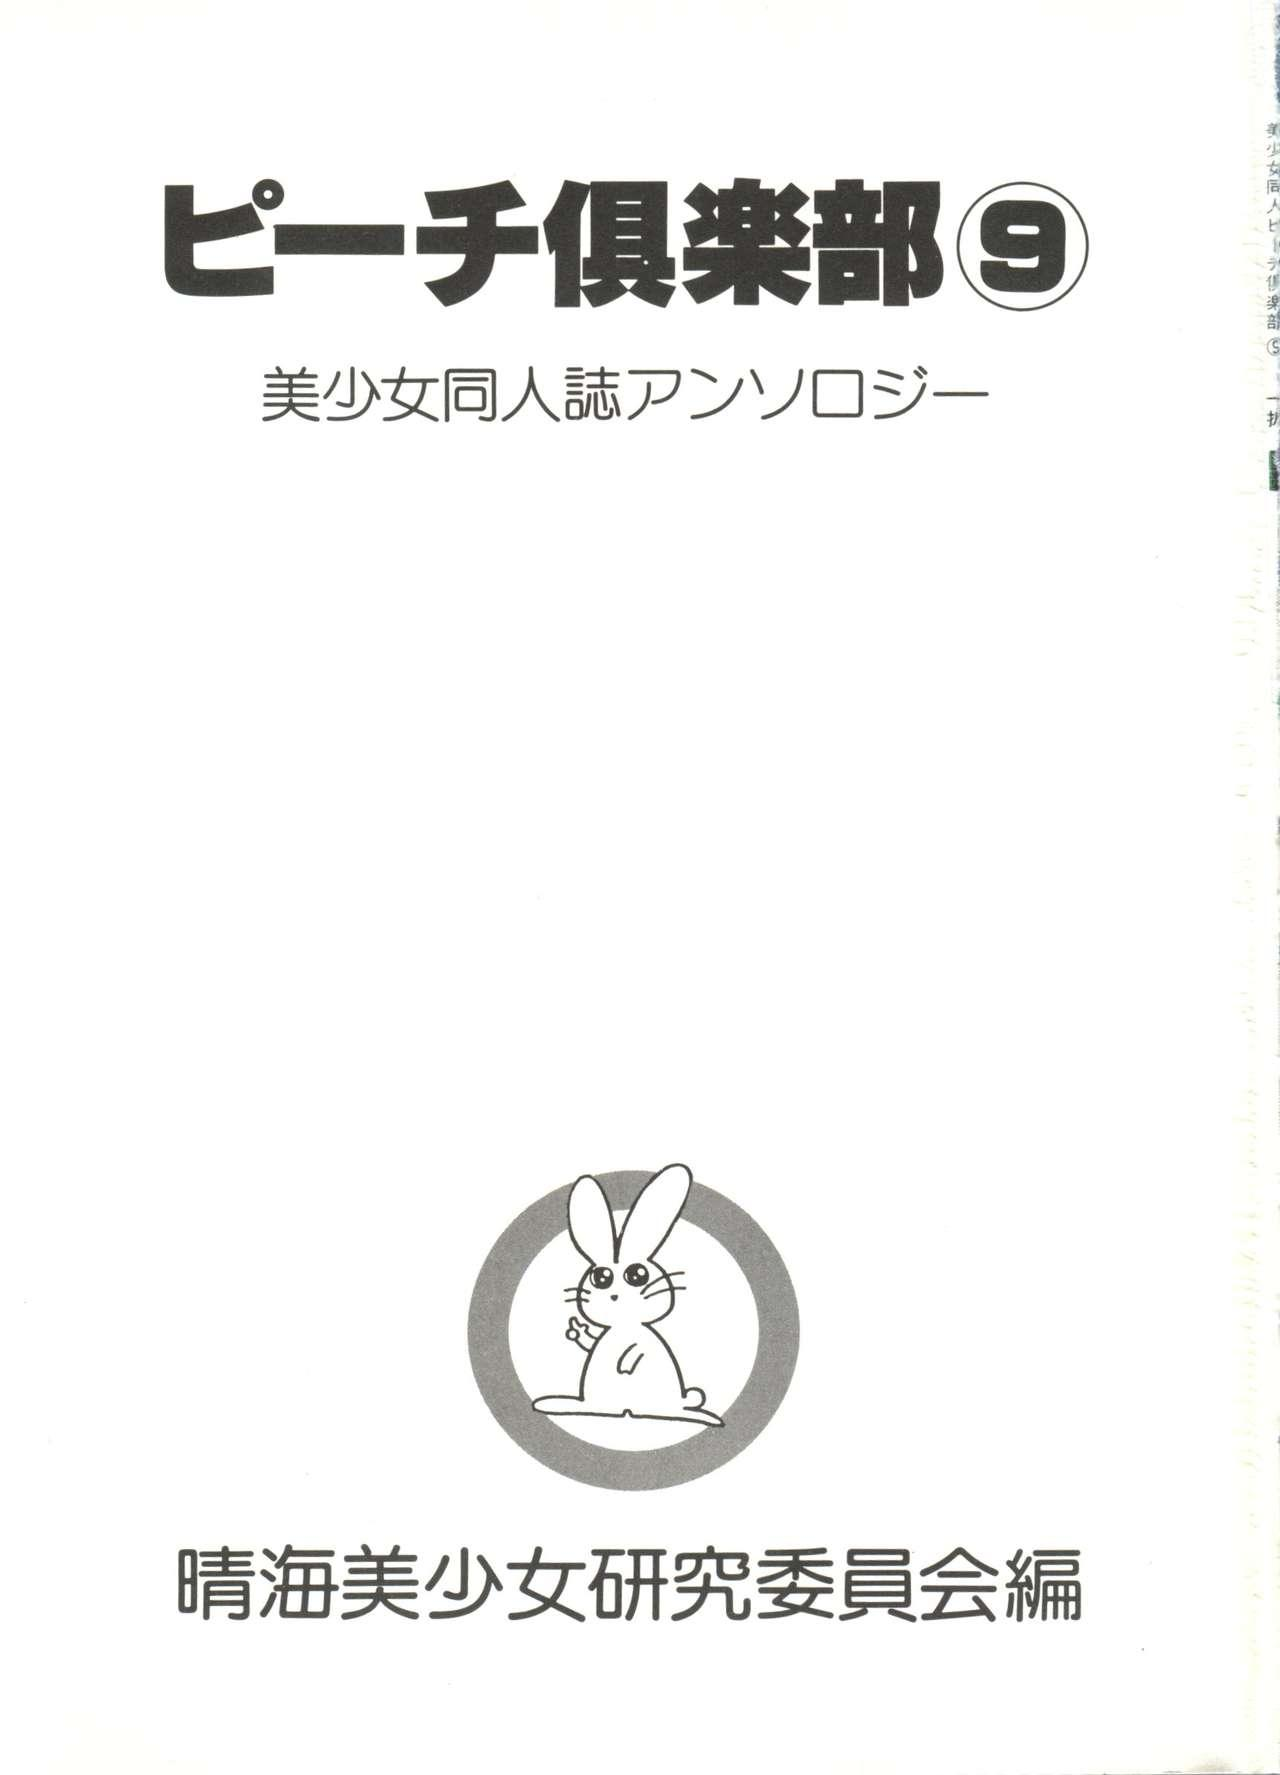 Bishoujo Doujin Peach Club - Pretty Gal's Fanzine Peach Club 9 2